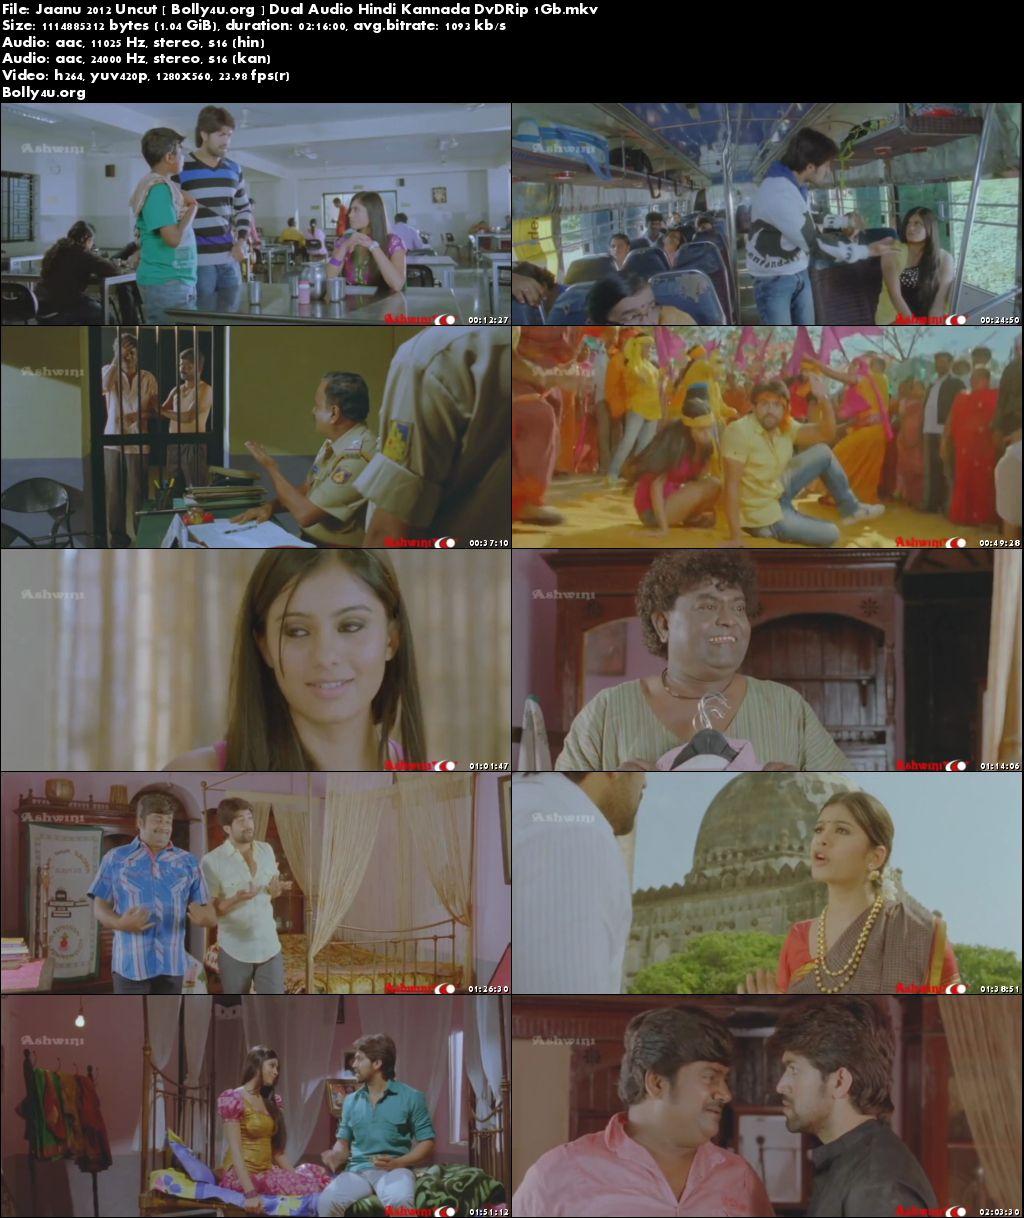 Jaanu 2012 DVDRip 1GB Hindi Dubbed UNCUT Dual Audio 720p Download